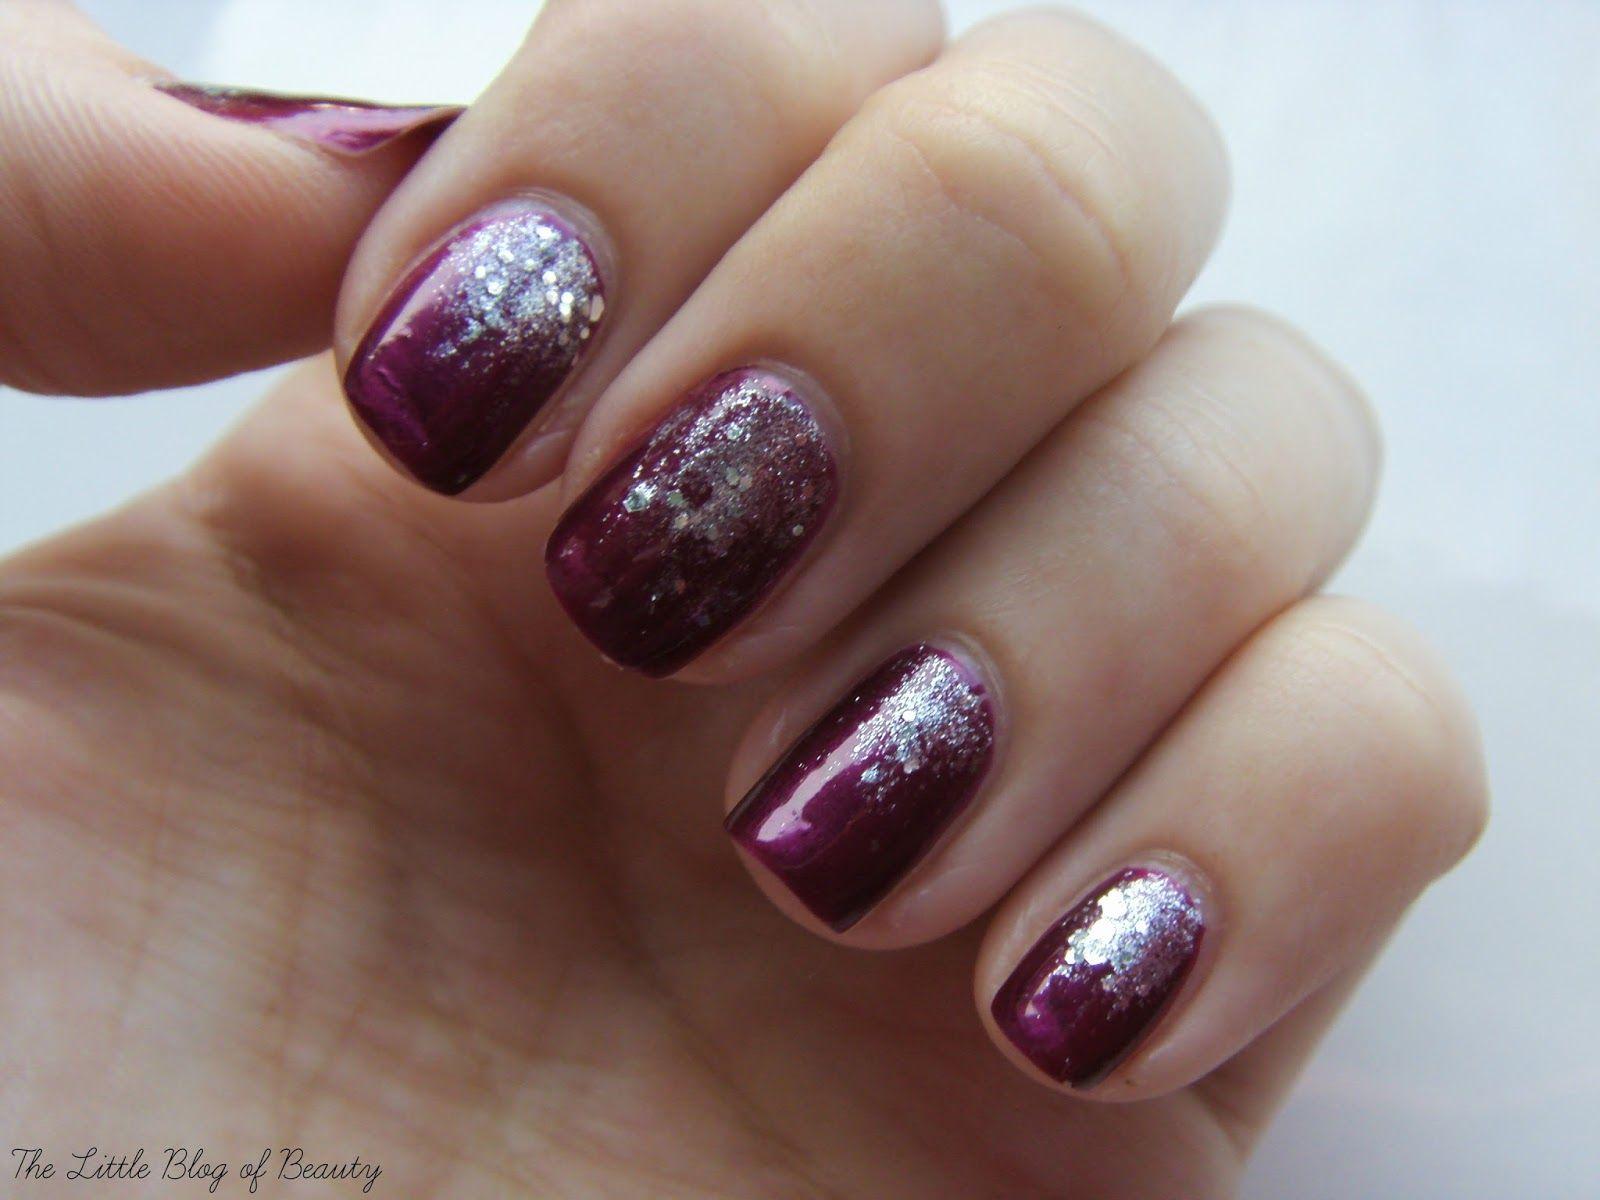 Nail Art Glitter Gradient Opi Beauty Nails And Makeup